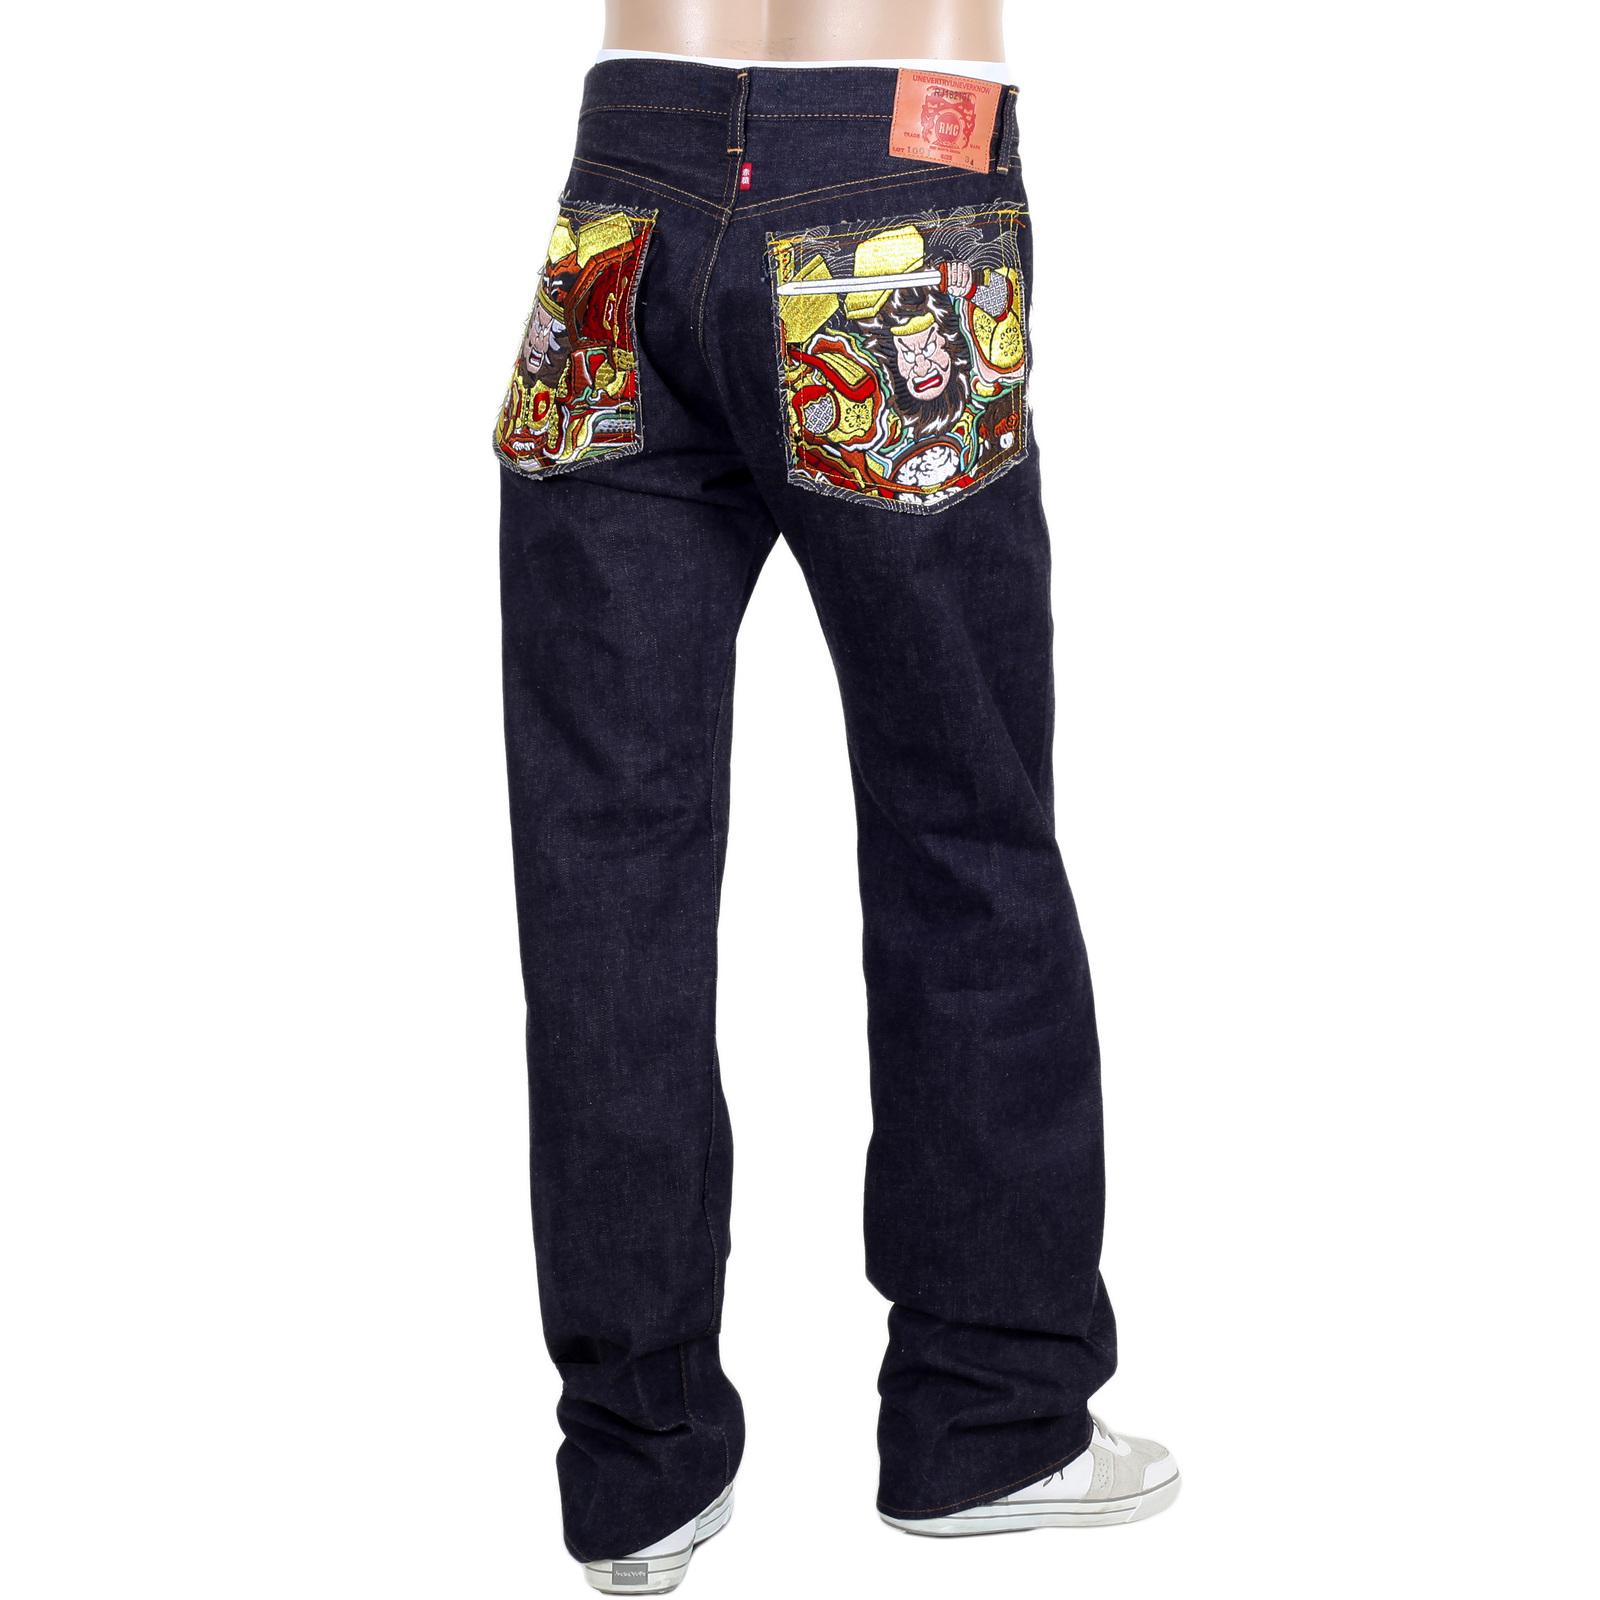 70287be6c7a RMC Martin Ksohoh Indigo Gold Embroidered Warriors Slim Model Japanese  Selvedge Denim Jeans RMC1956